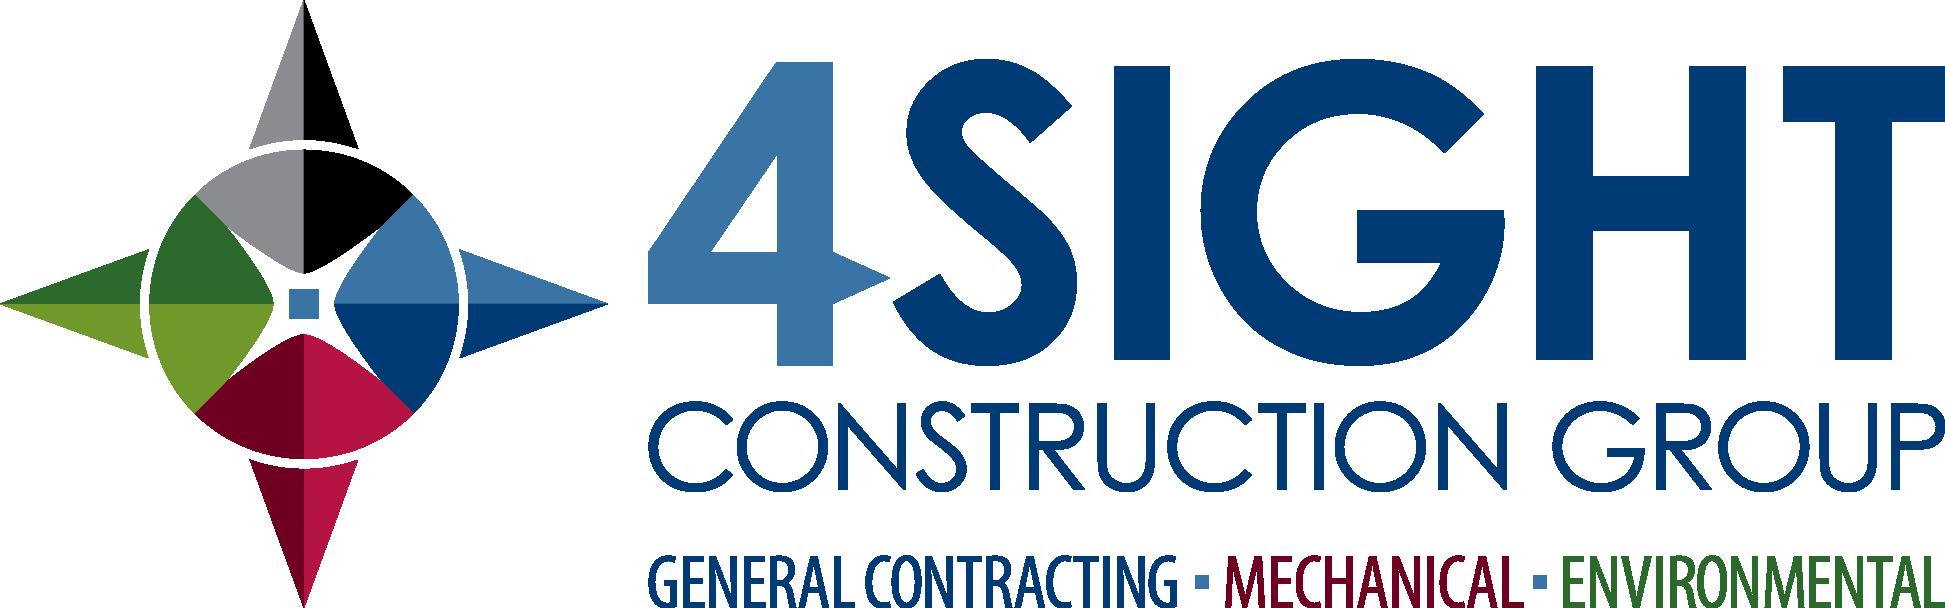 4Sight Construction Group-logo